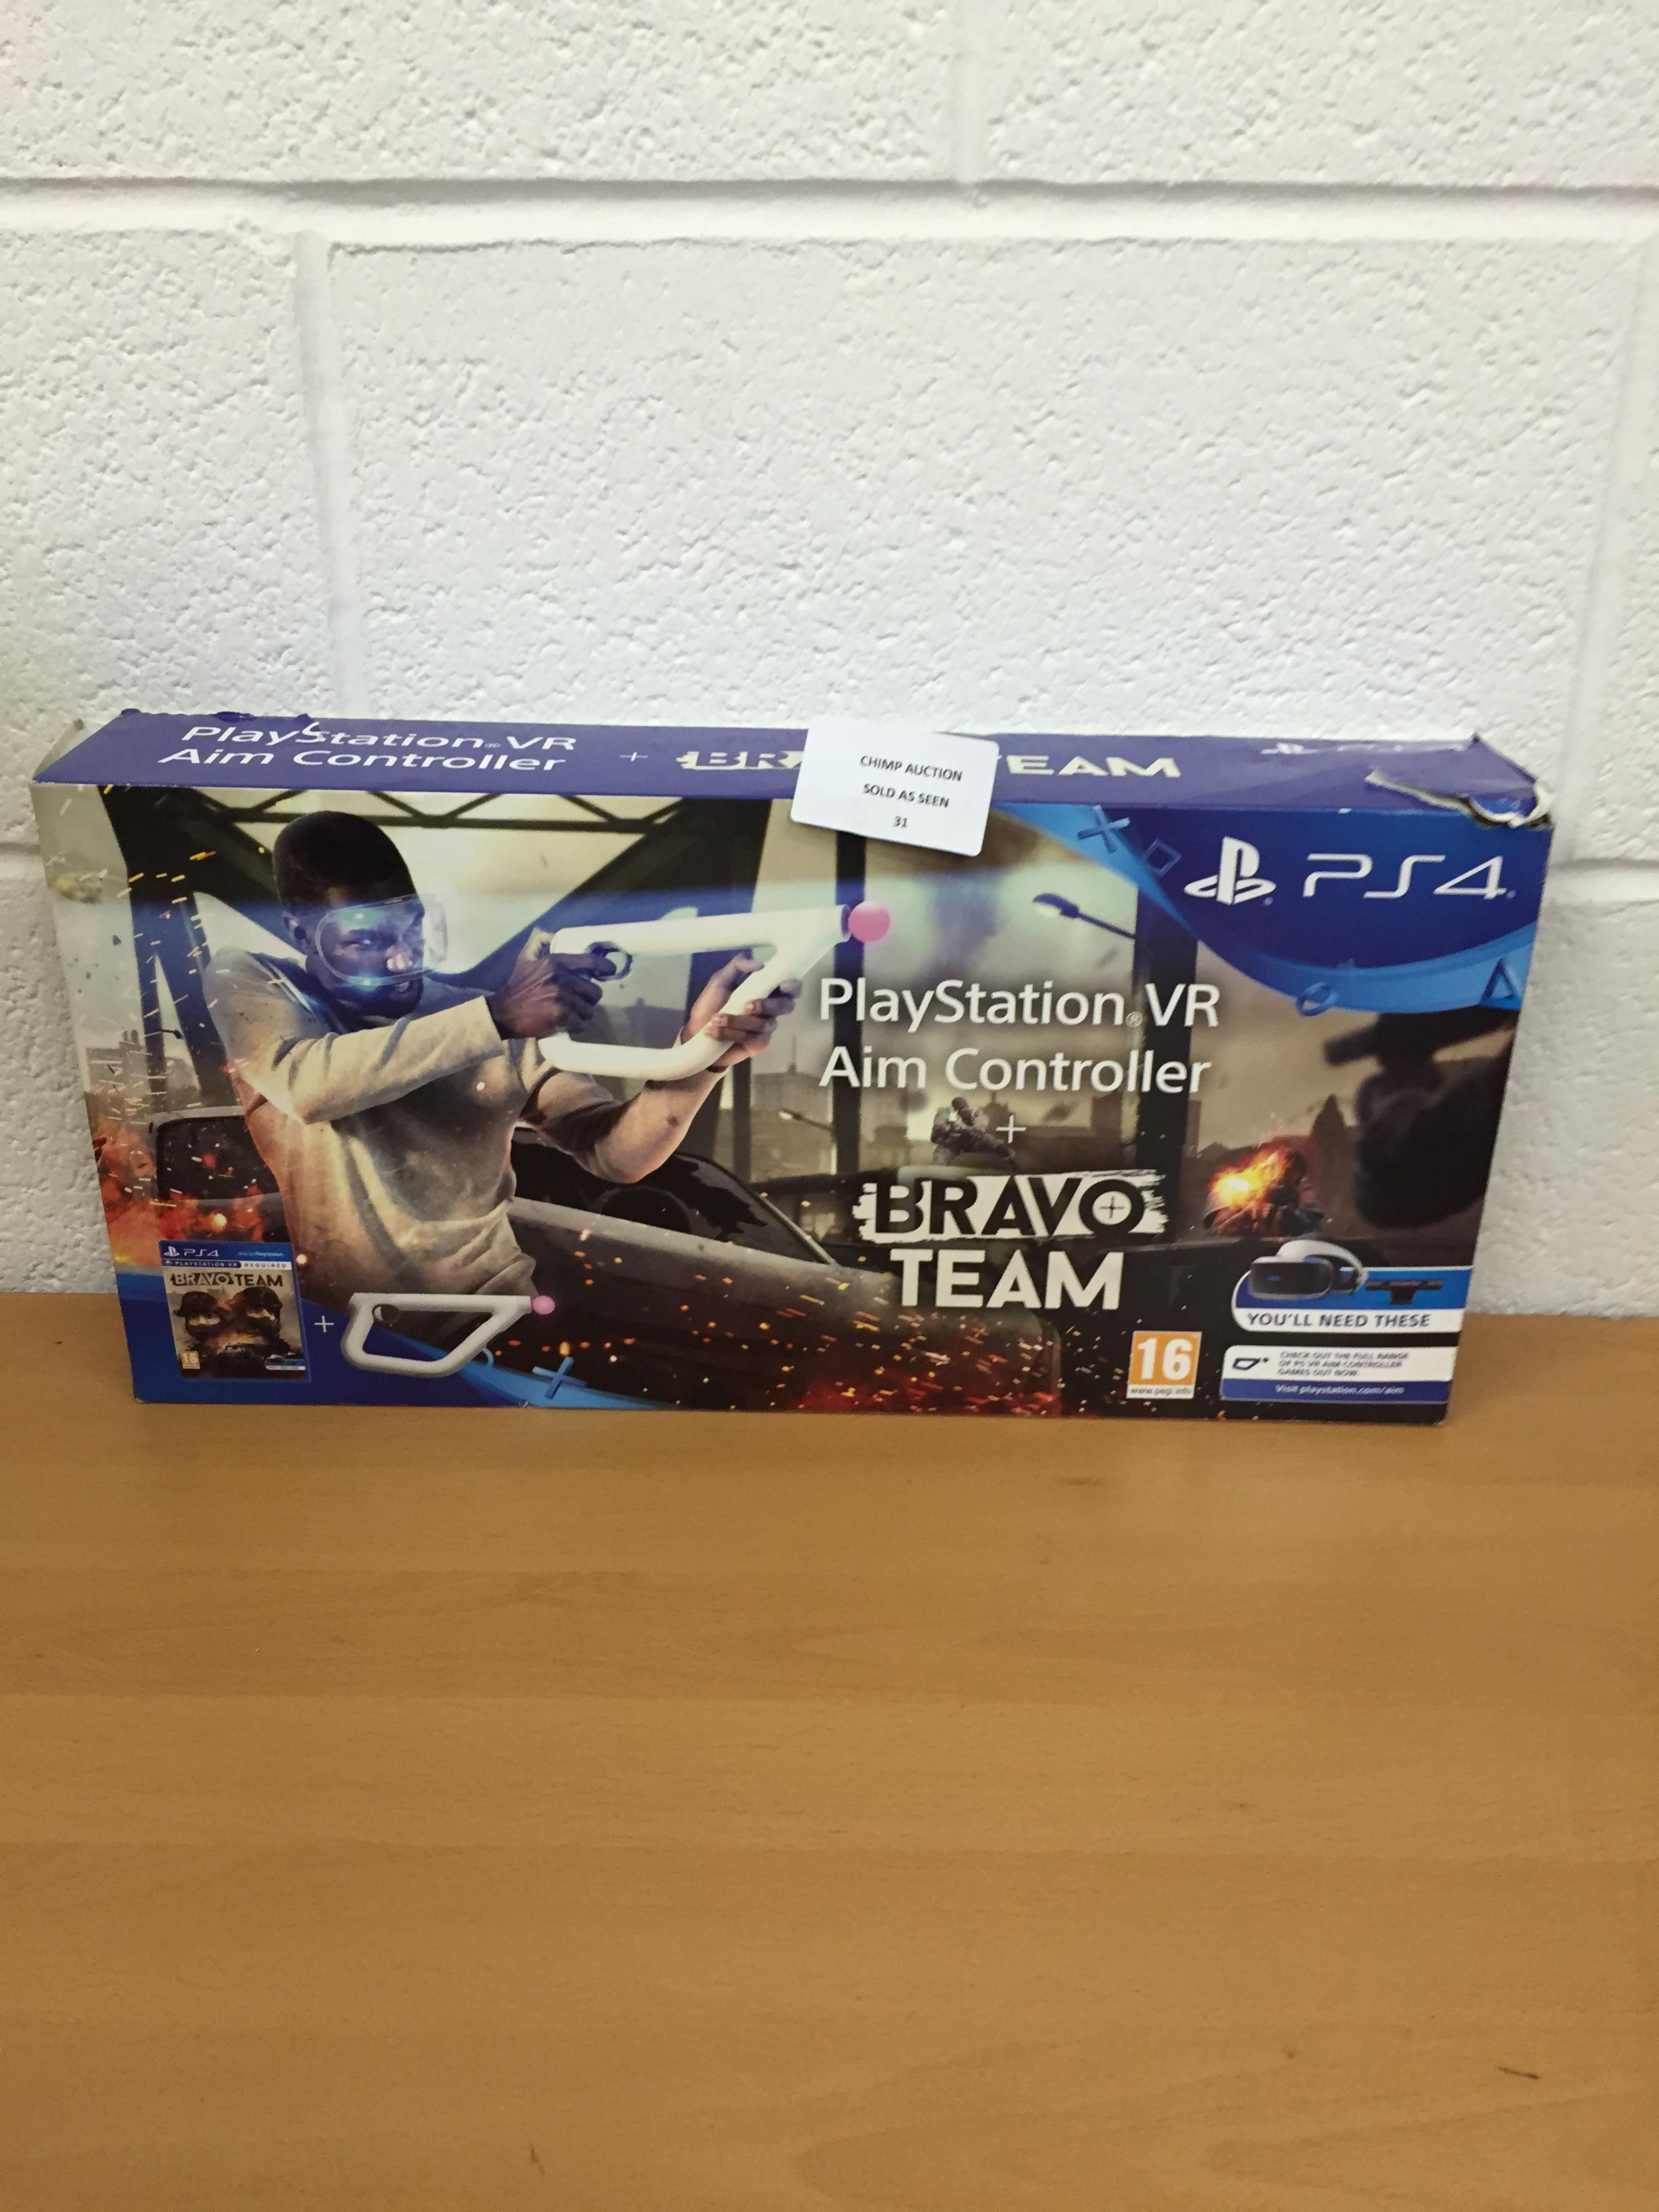 Lot 31 - Bravo Team + Aim Controller Bundle (Sony PS4 VR) RRP £119.99.